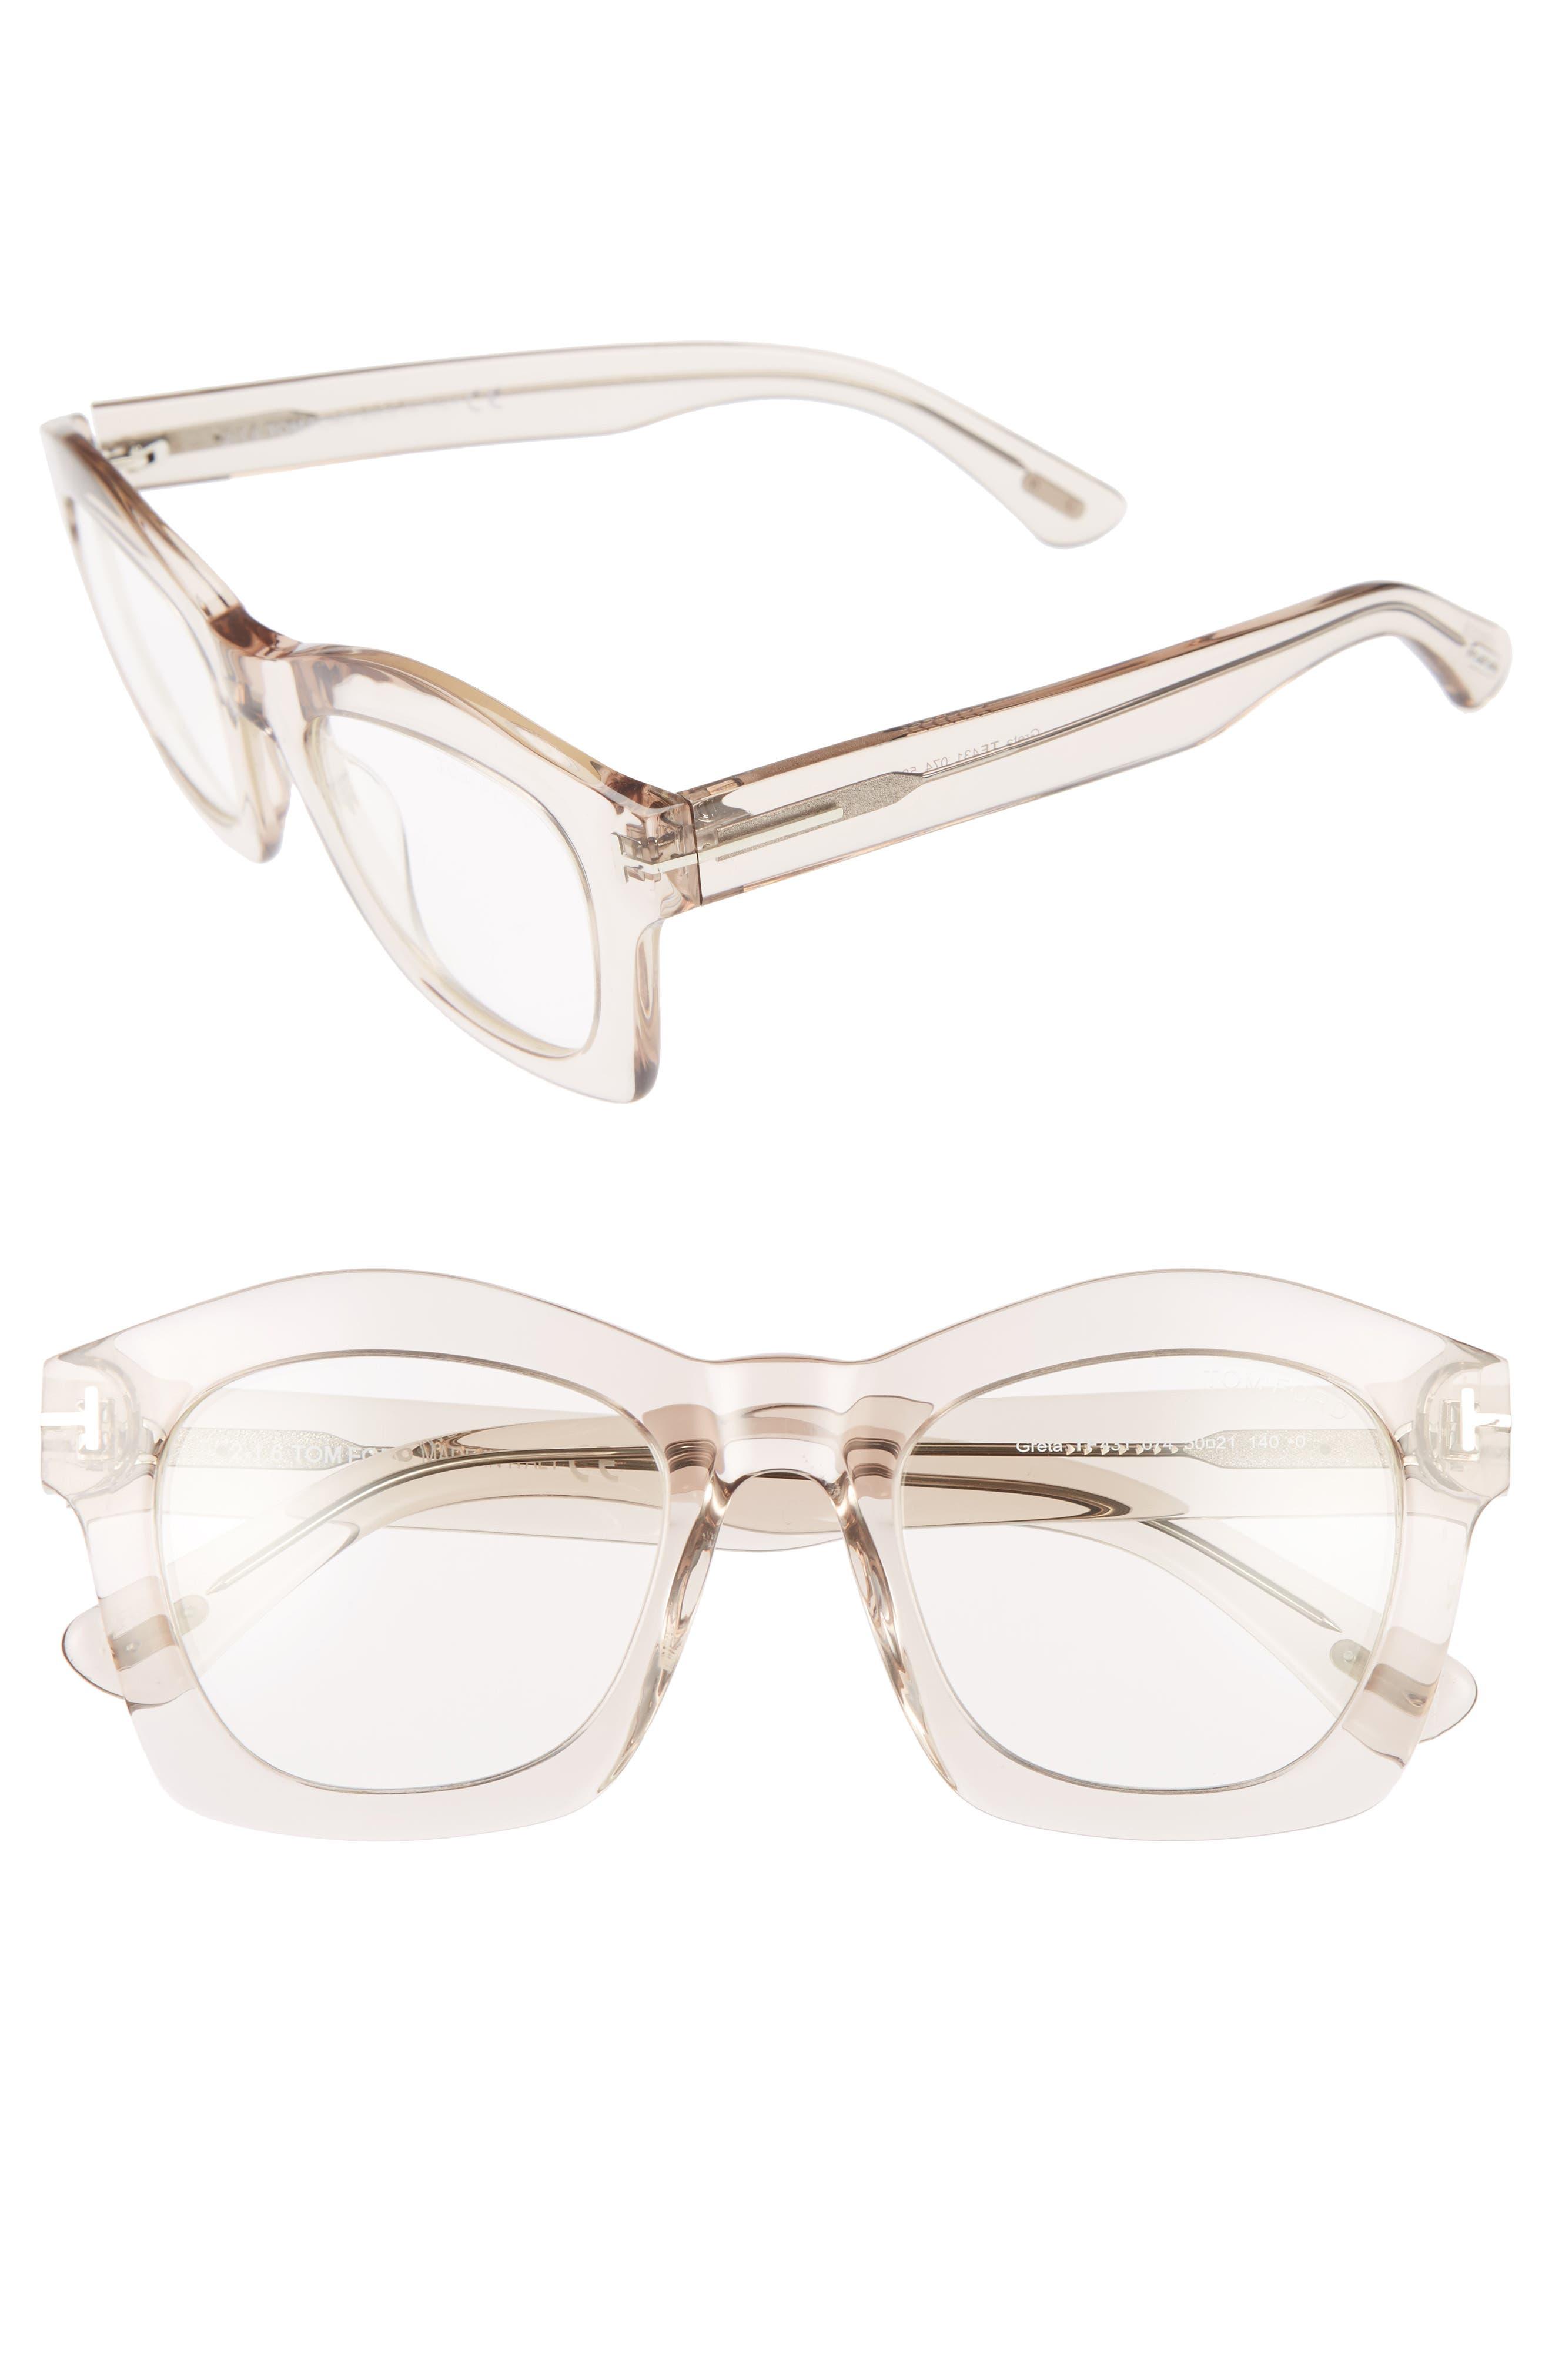 Main Image - Tom Ford 'Greta' 50mm Sunglasses